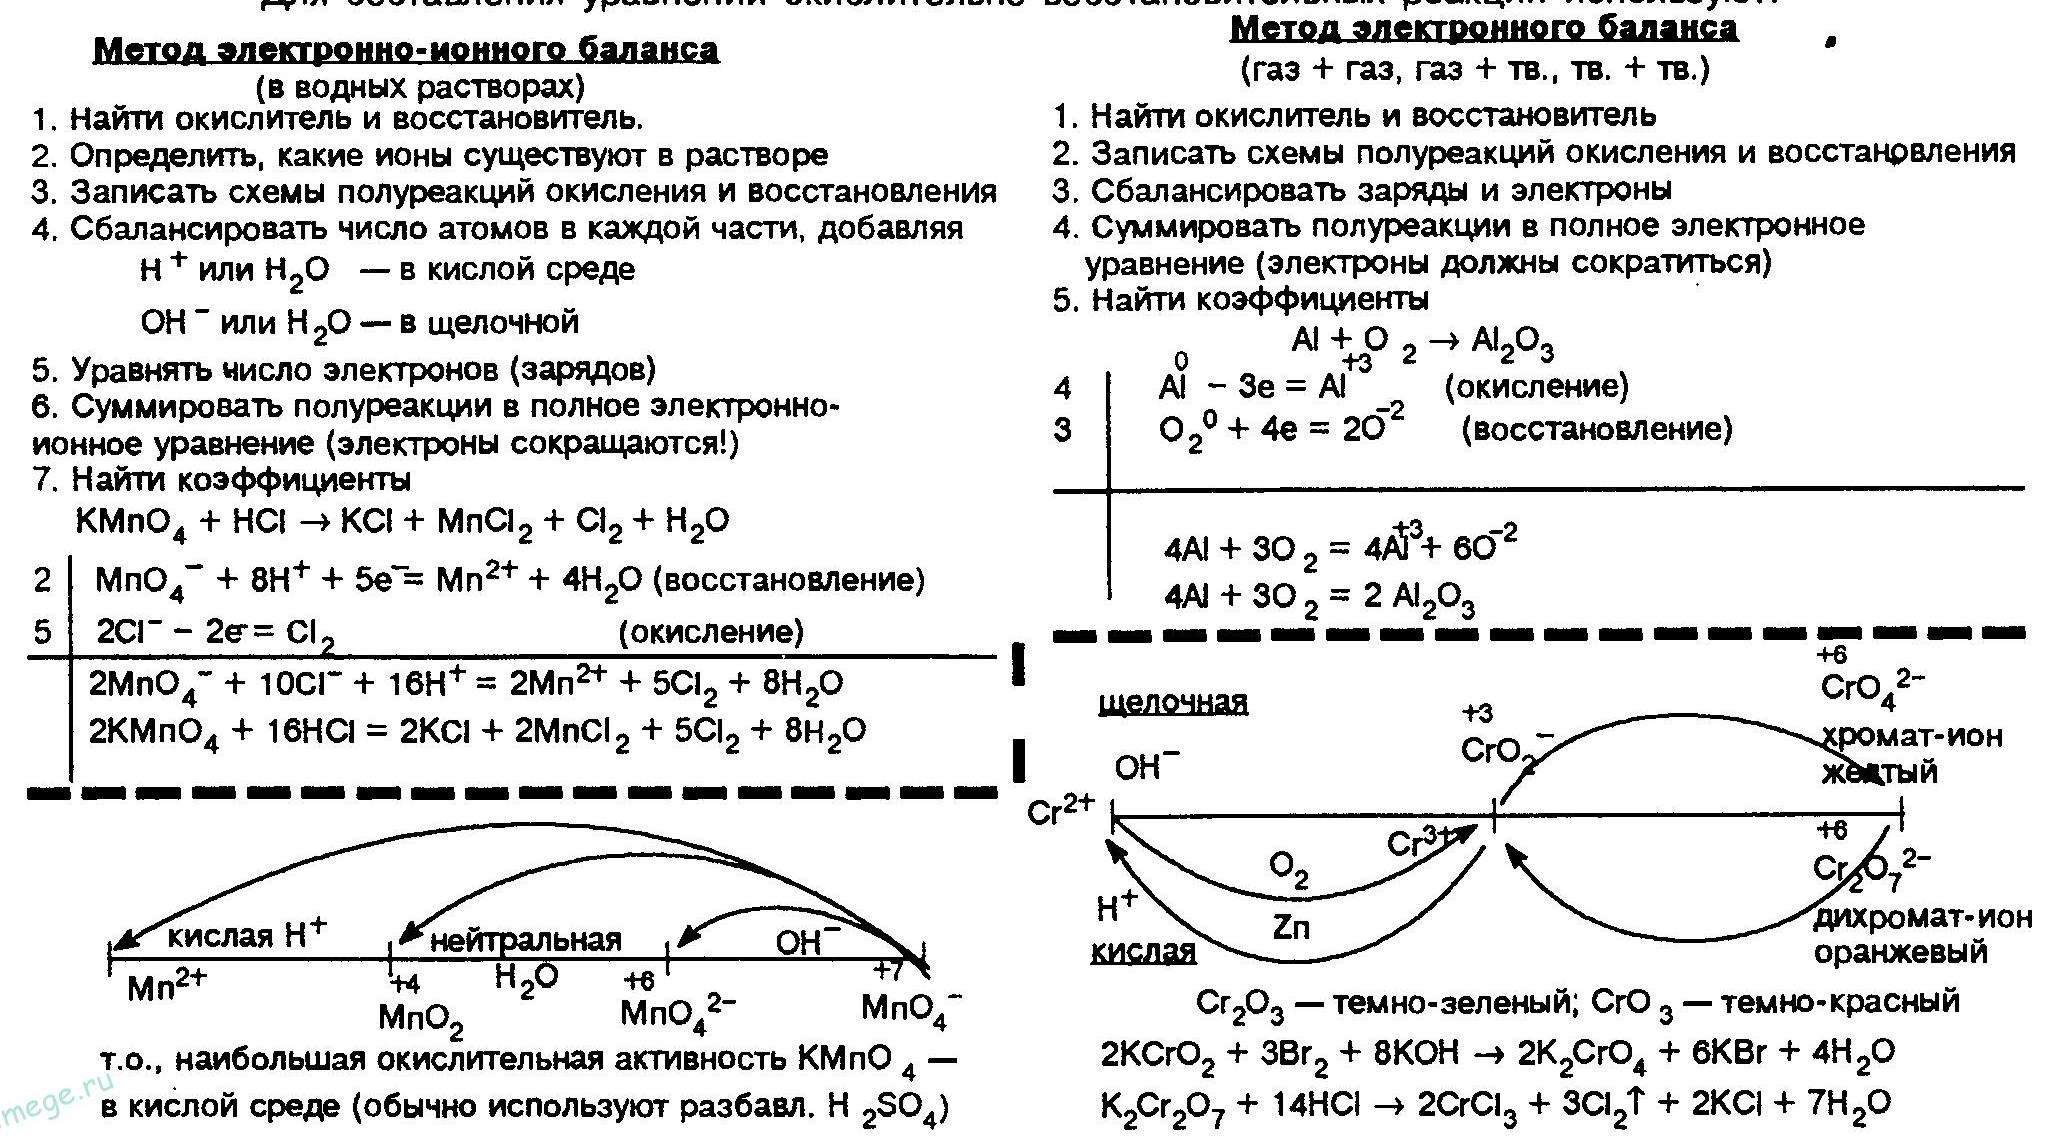 metod-balansa-i-polureakcij